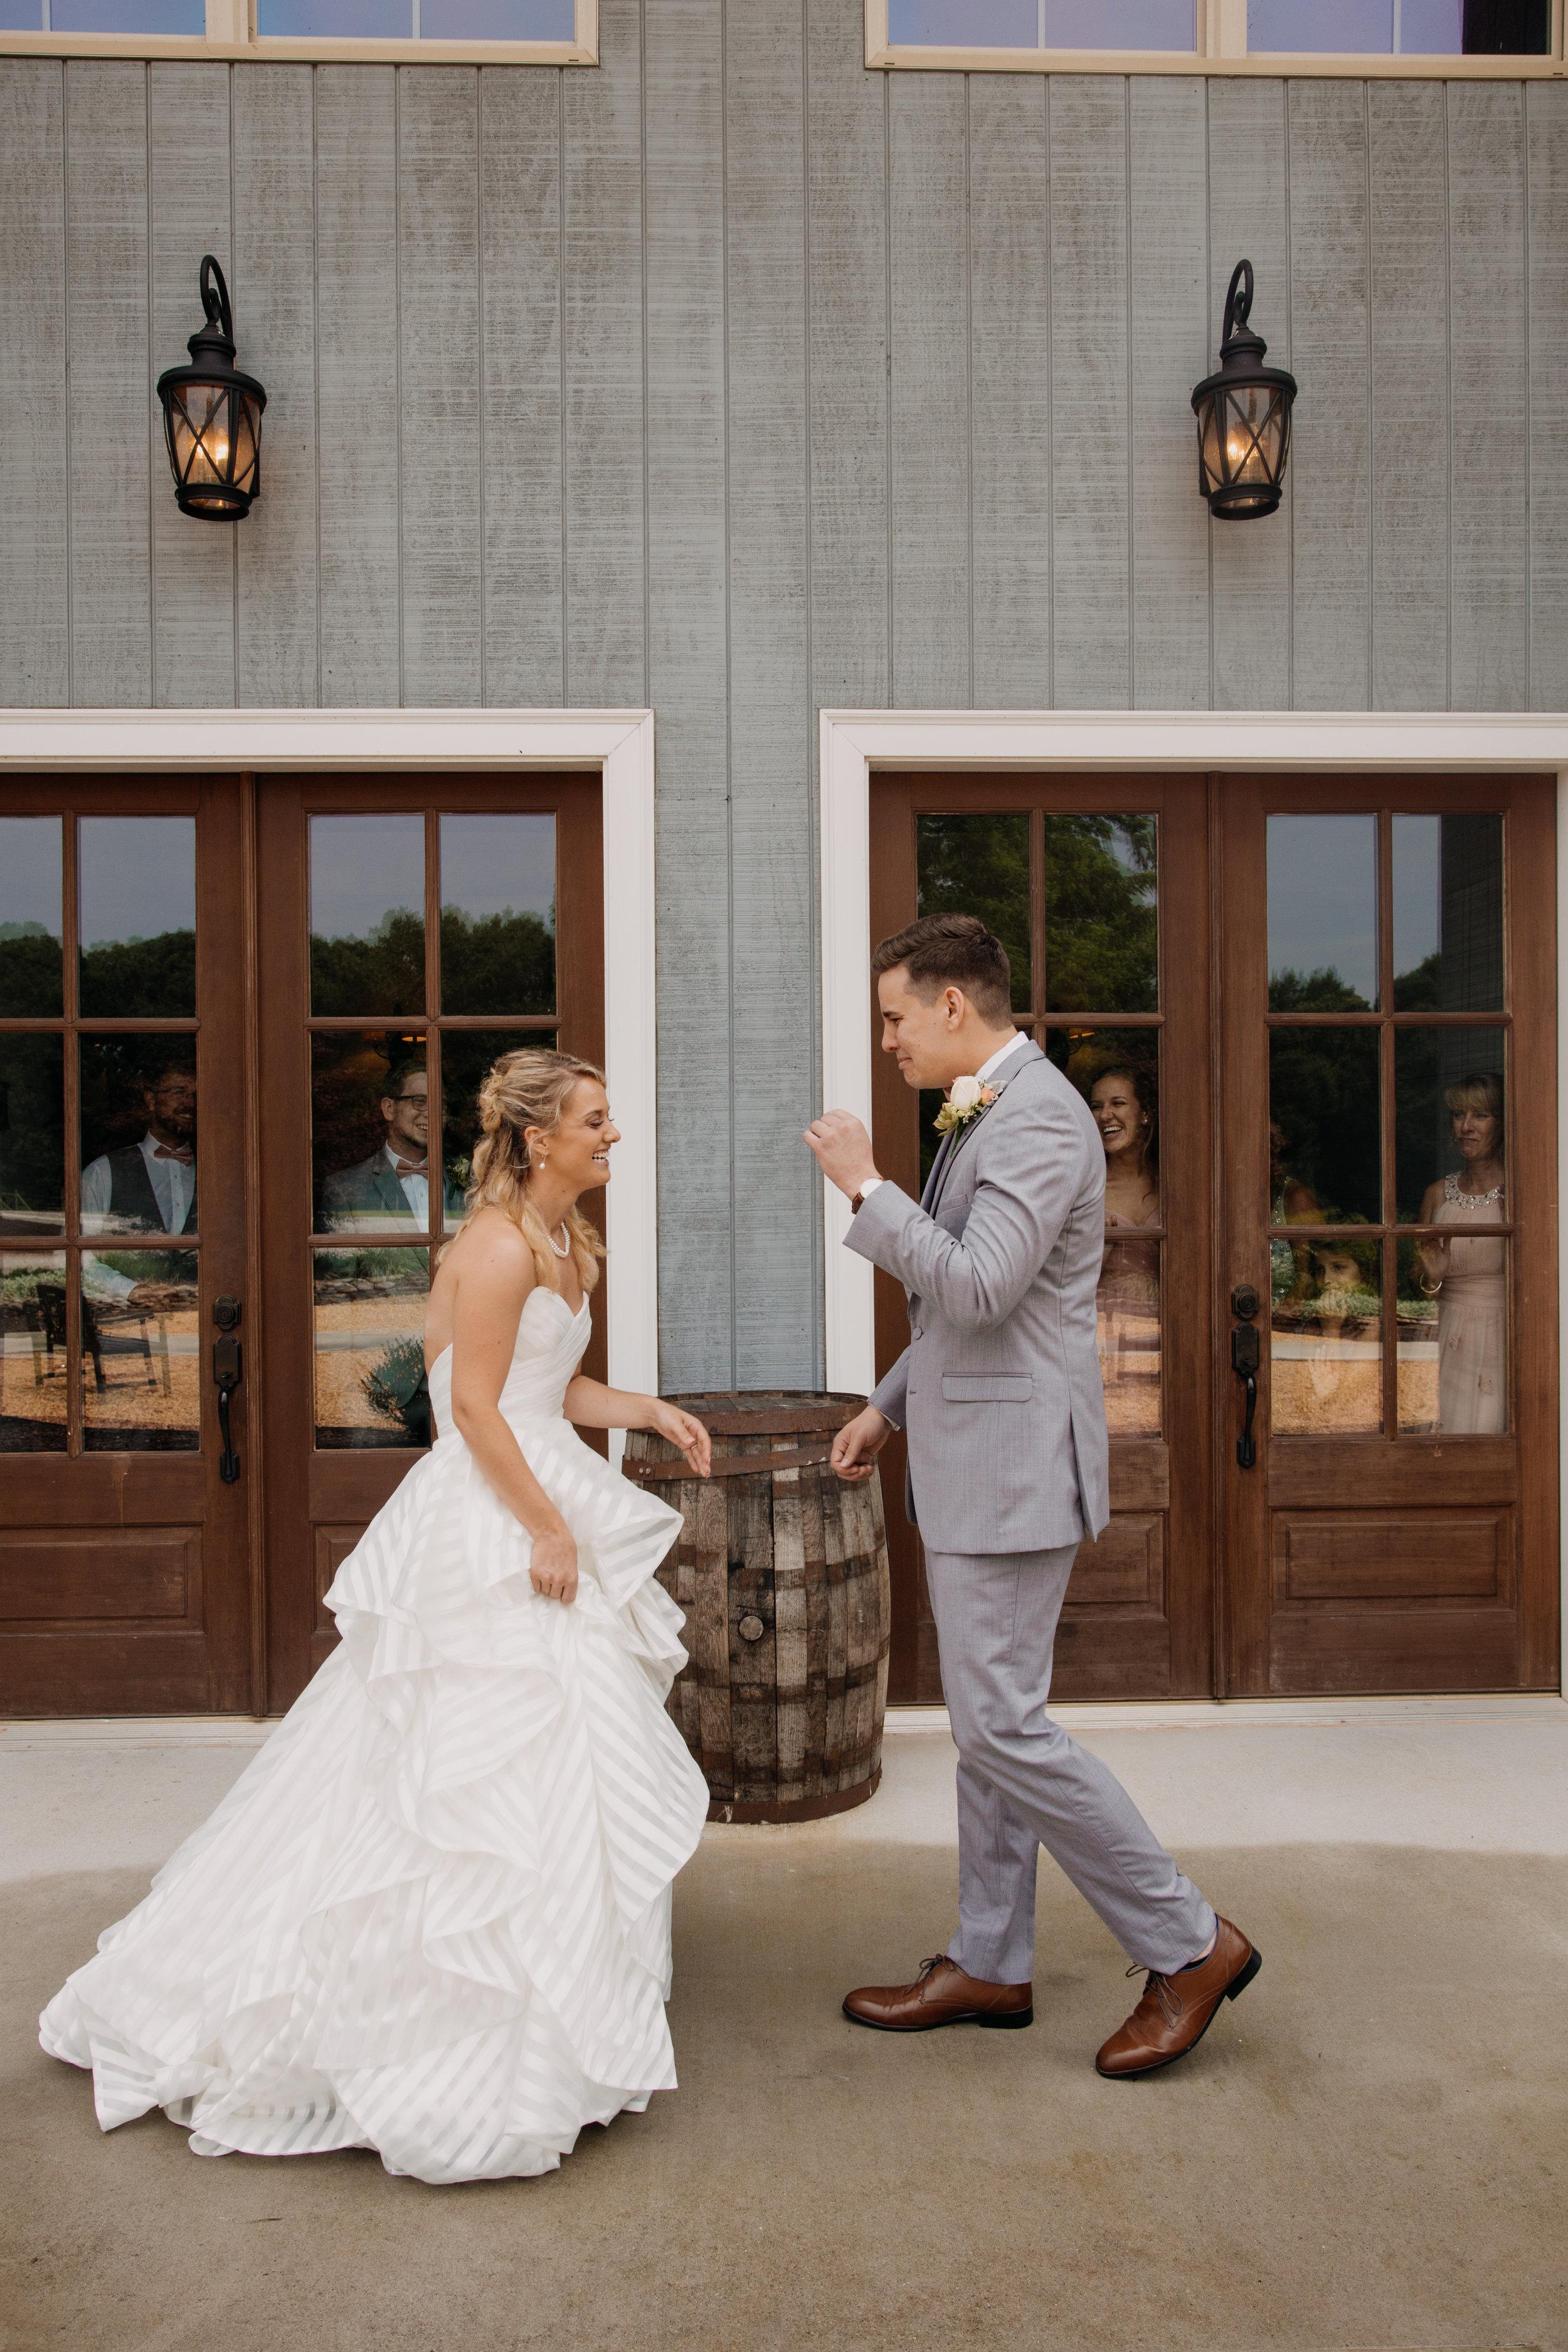 Rachel and Christian Final Wedding Images-139.JPG